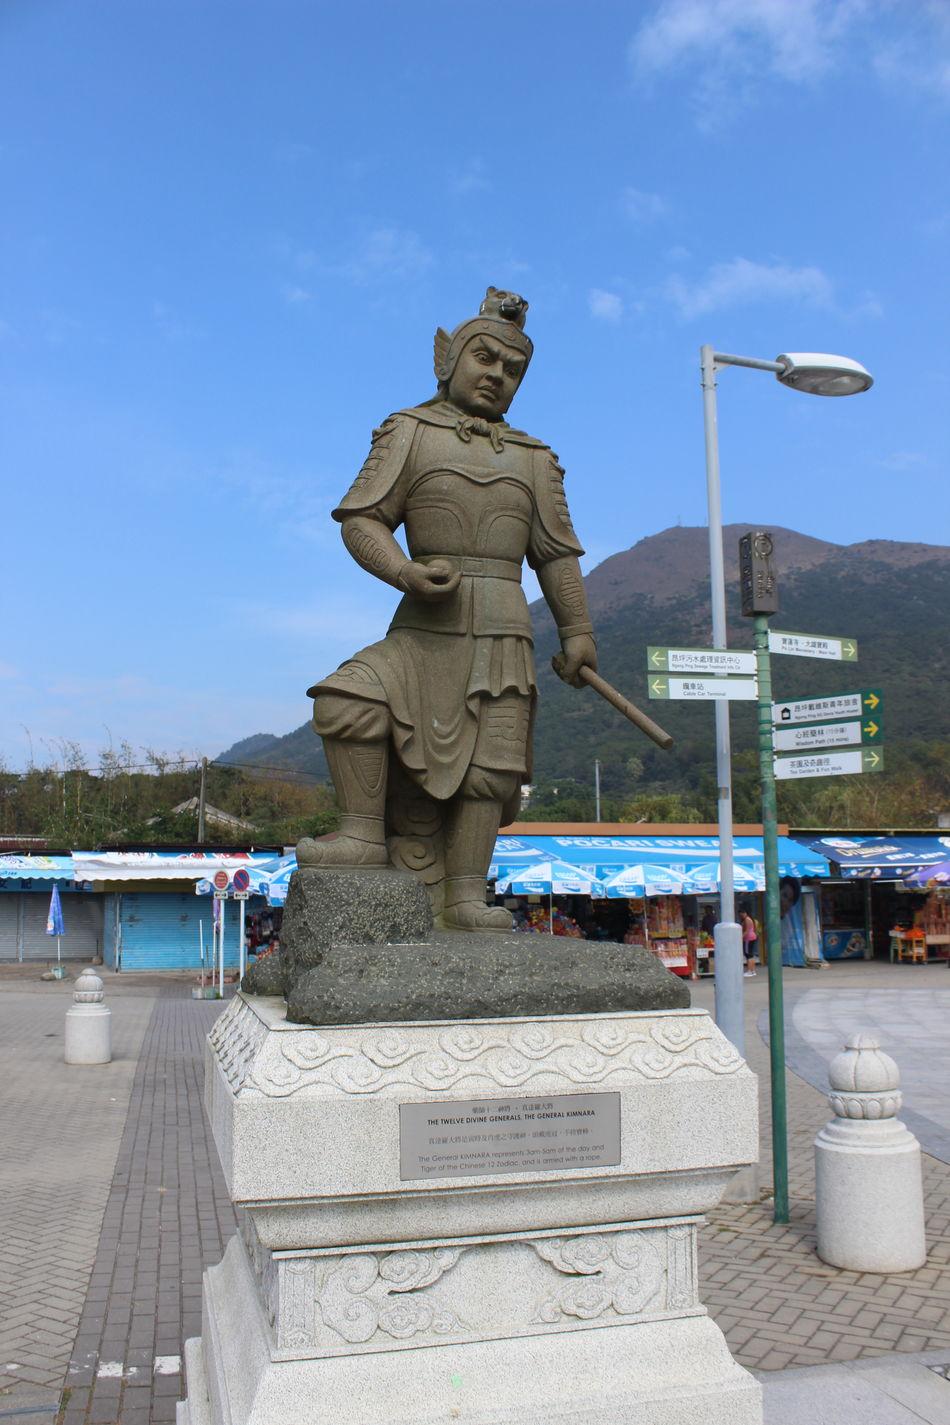 Outdoors Statue Sculpture No People Day HongKong Travel Photography Cultures Tian Tan Buddha (Giant Buddha) 天壇大佛